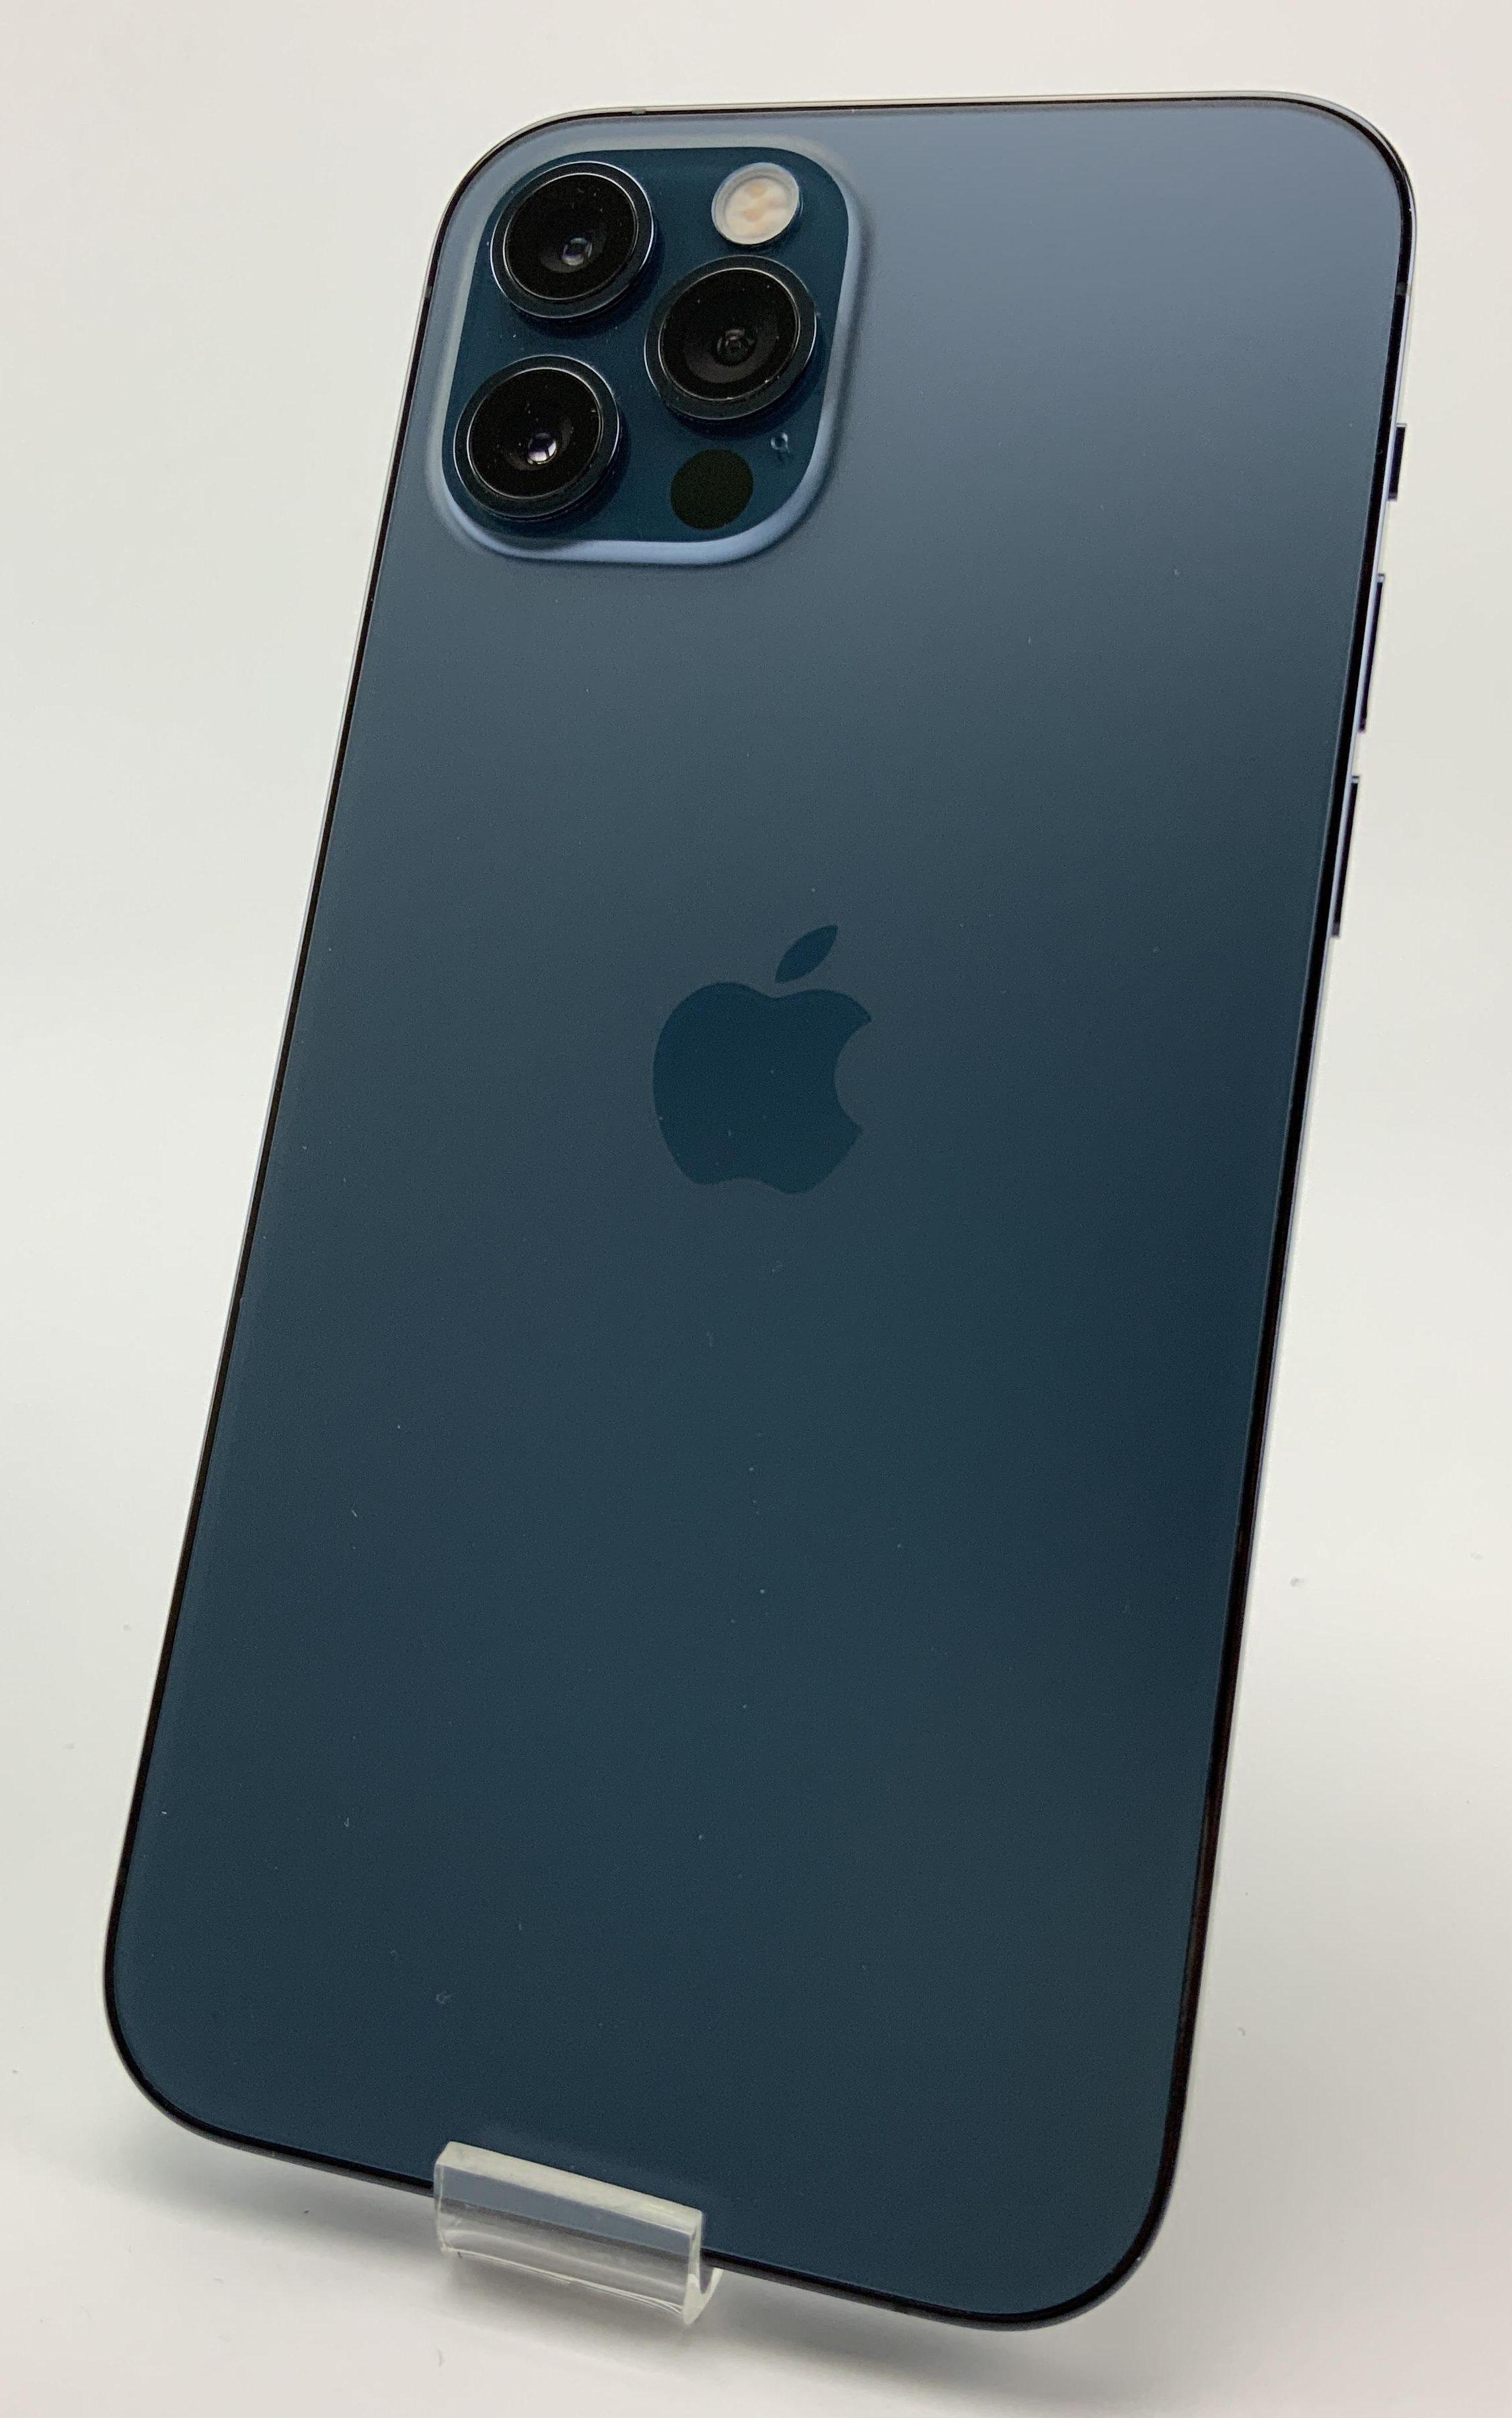 iPhone 12 Pro 256GB, 256GB, Pacific Blue, bild 2